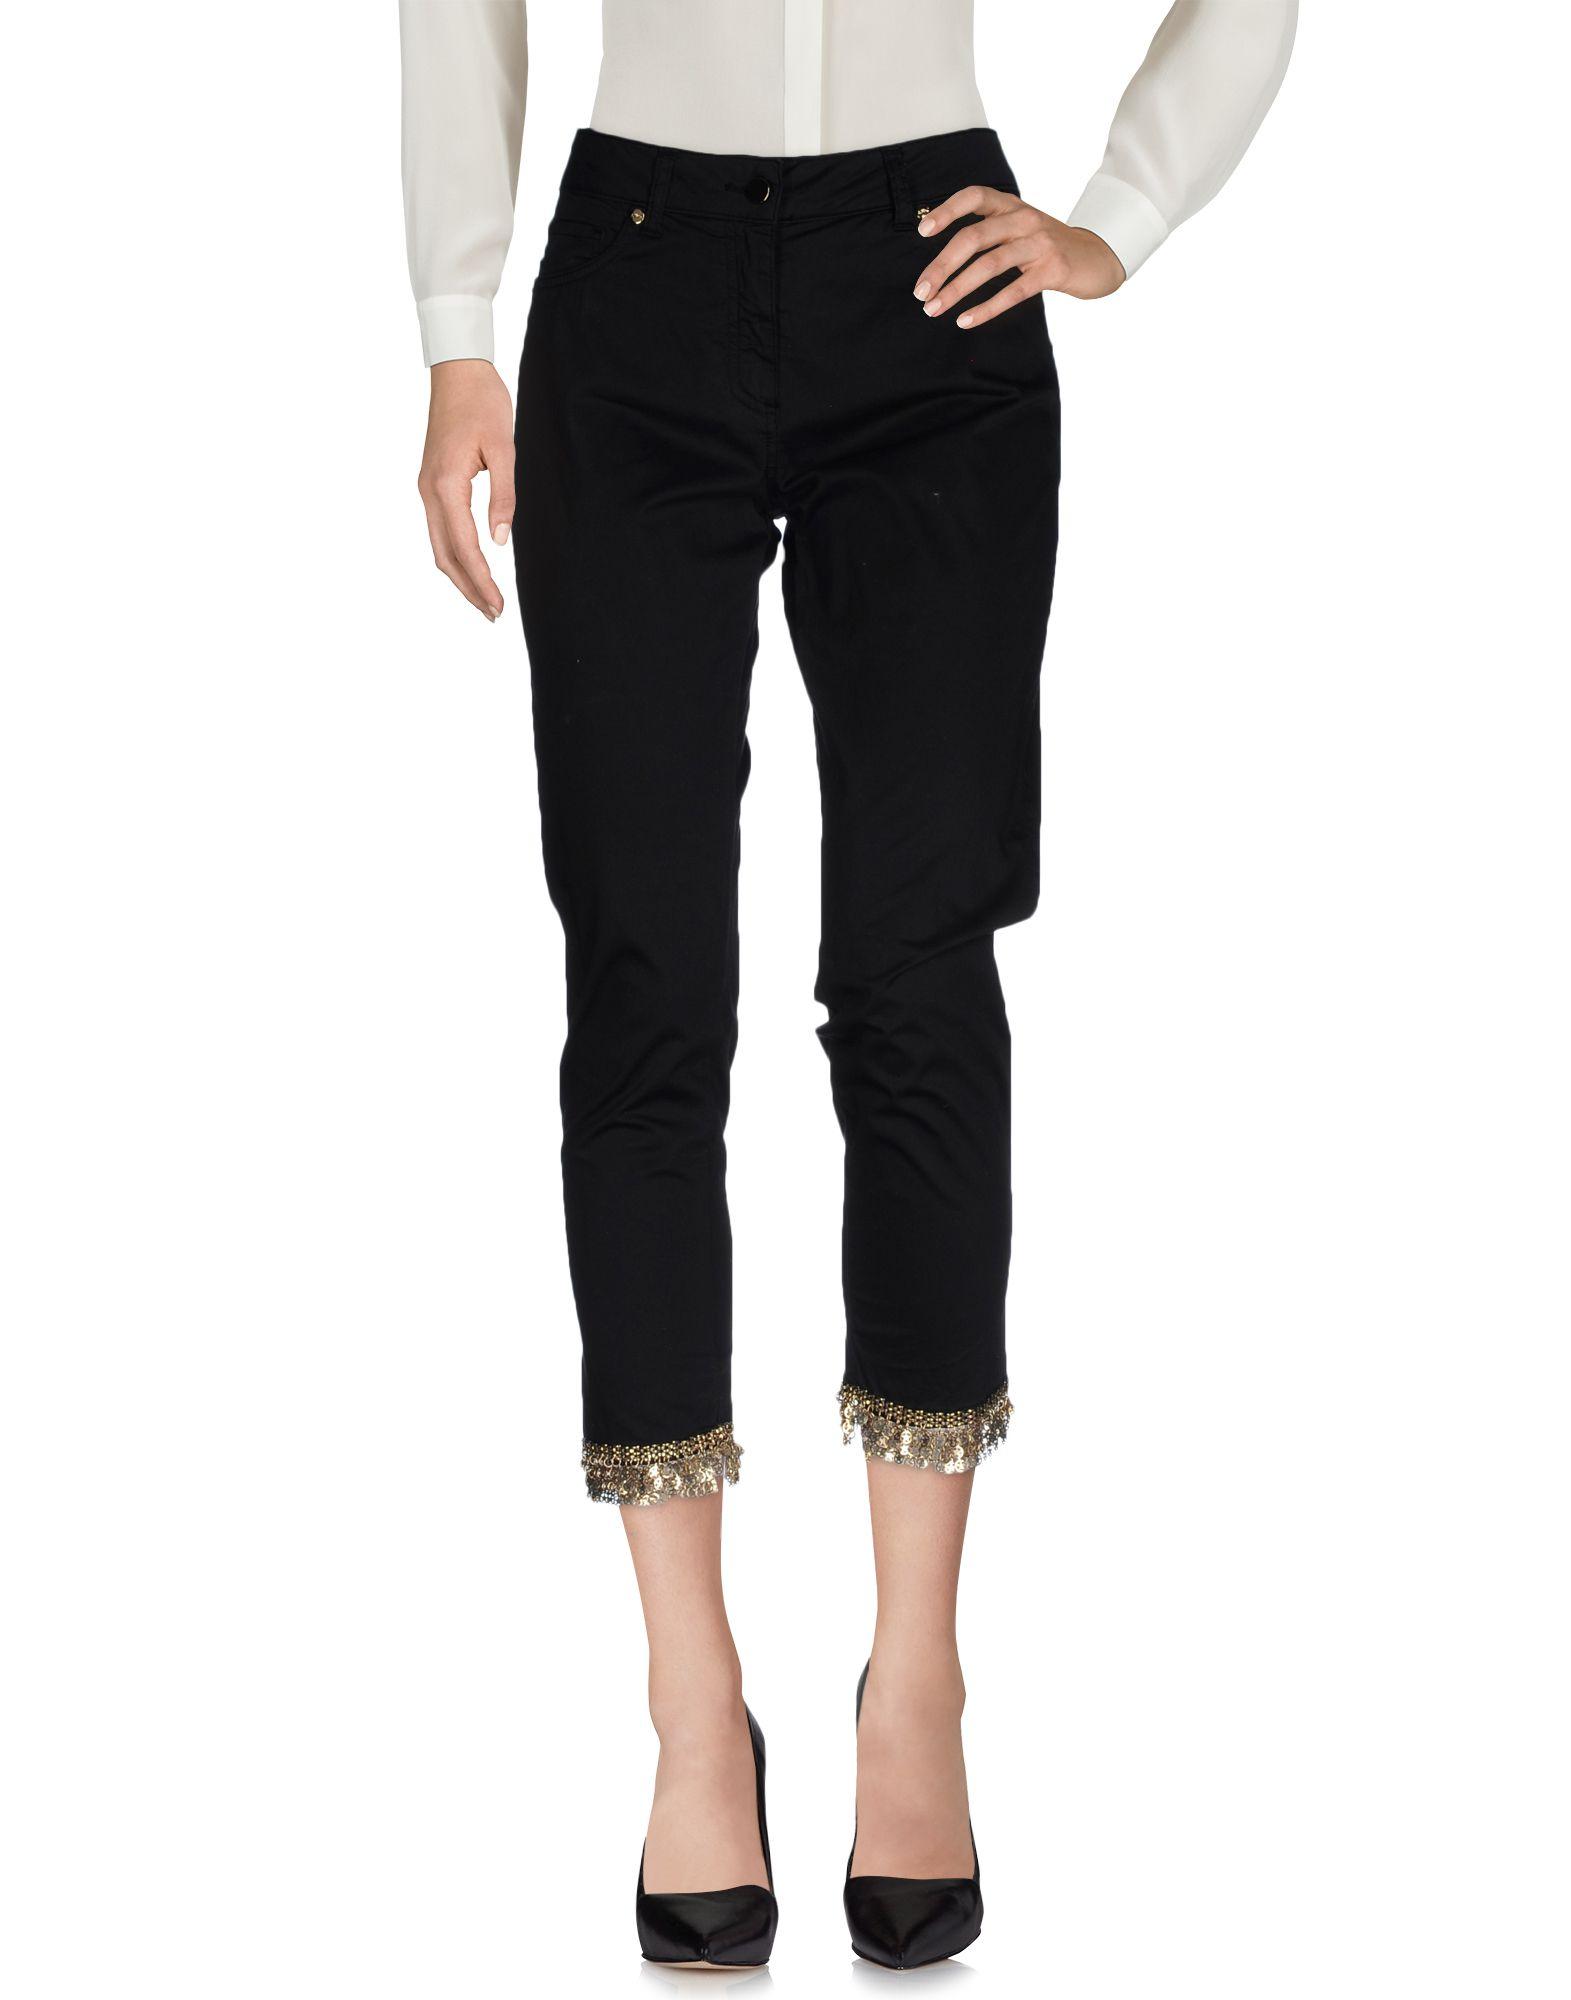 ANNA RACHELE JEANS COLLECTION Повседневные брюки anna rachele jeans collection накидка